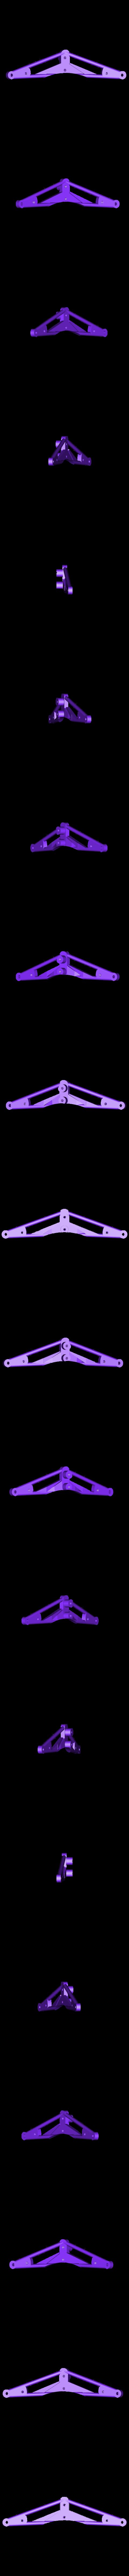 upper suspension arms.stl Download free STL file Aryton Senna's Mclaren MP4/6 3d Printed RC F1 Car • 3D printing design, brett